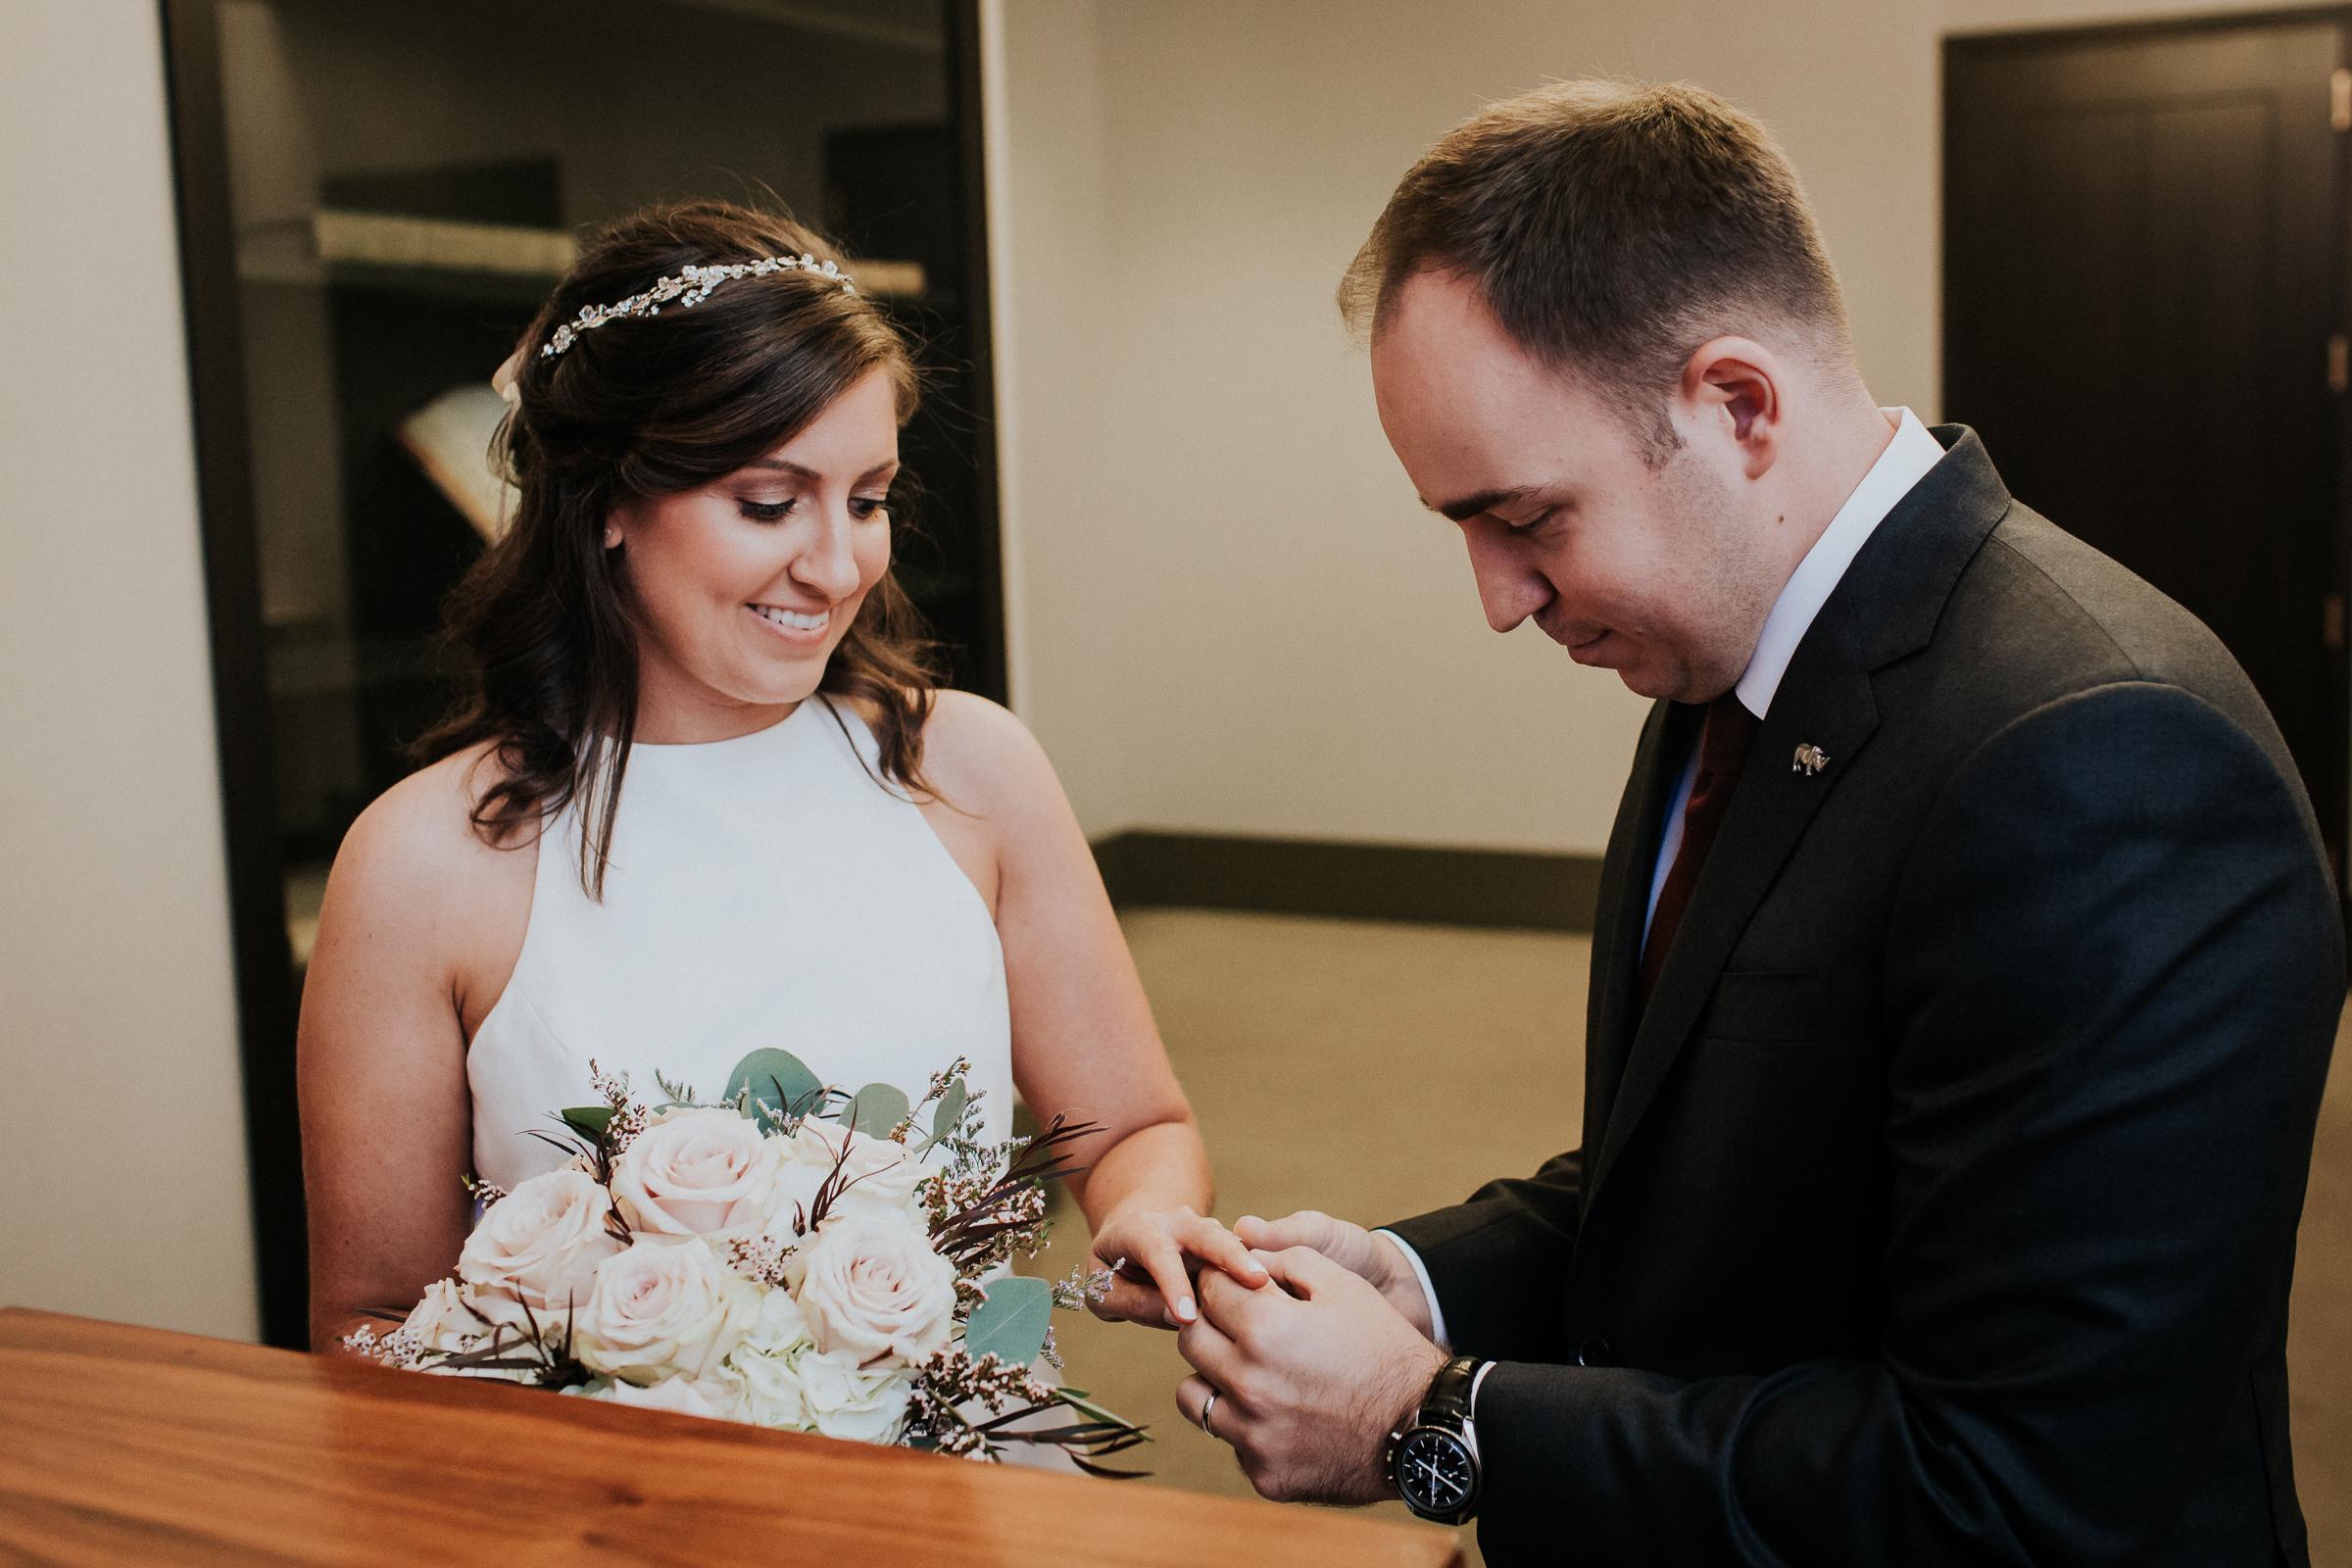 Casa-Apicii-Intimate-Wedding-City-Hall-Elopement-New-York-Documentary-Wedding-Photographer-13.jpg